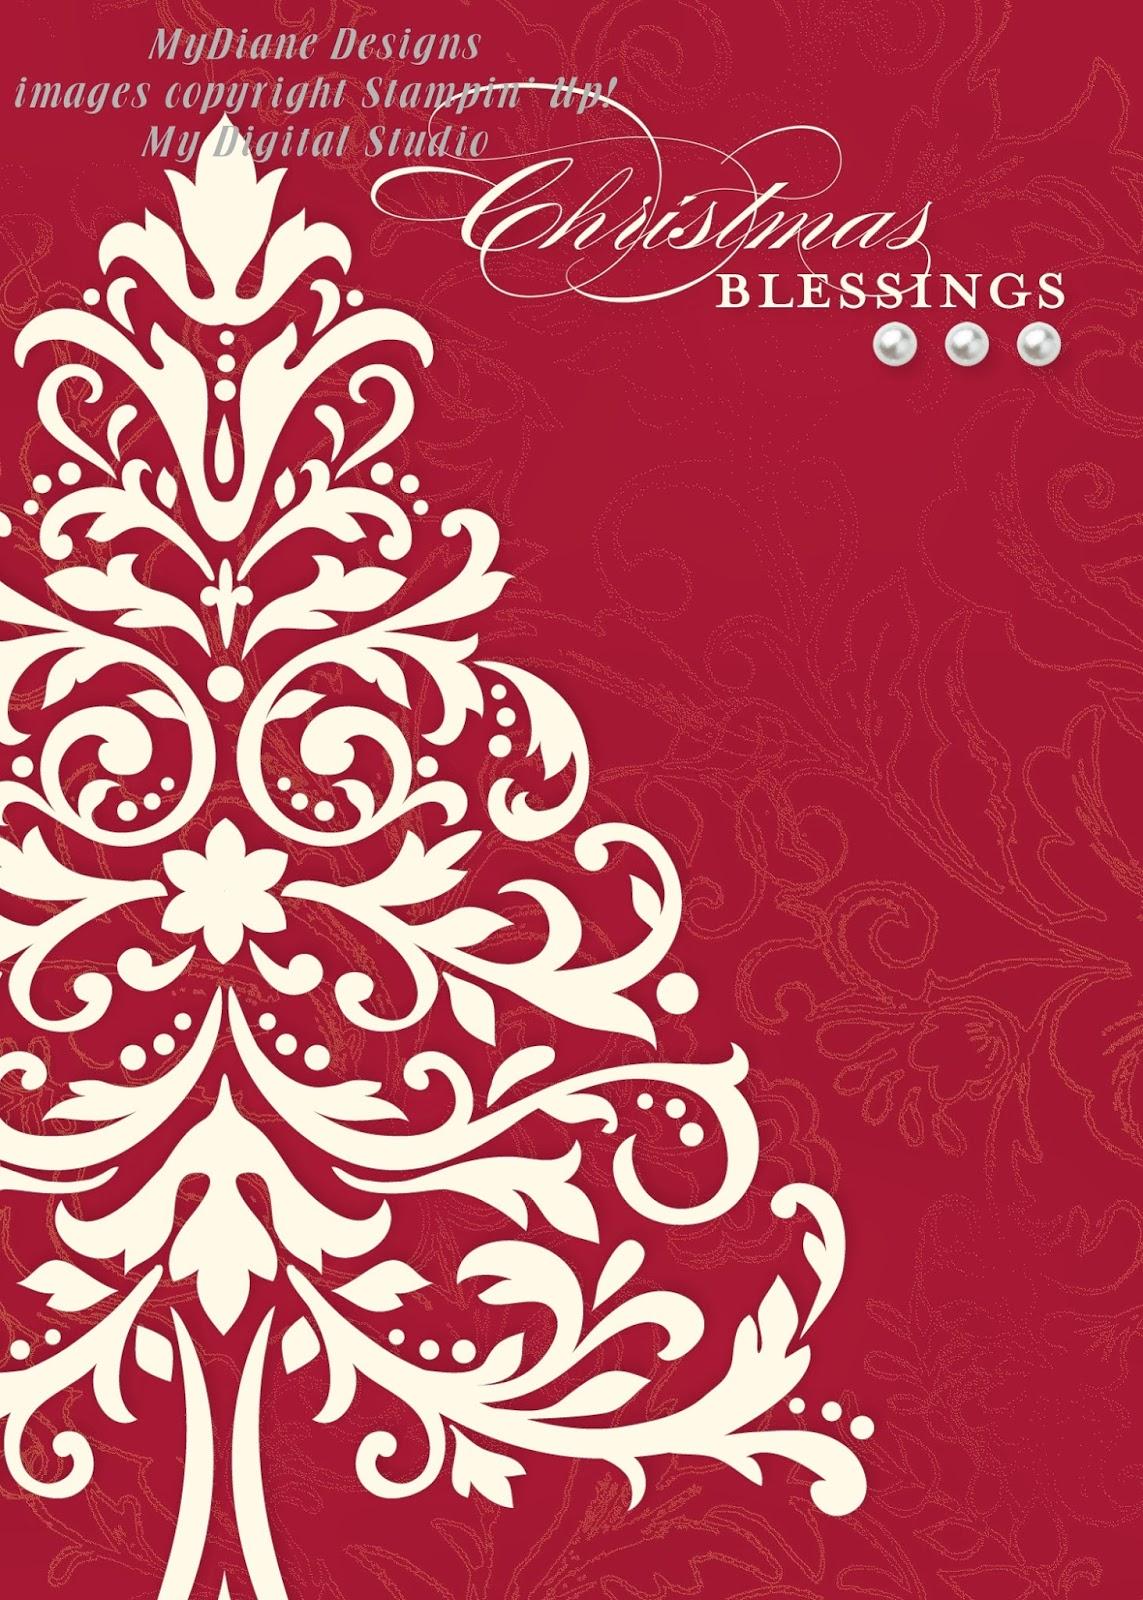 Mydiane designs 2013 christmas card for Design for christmas